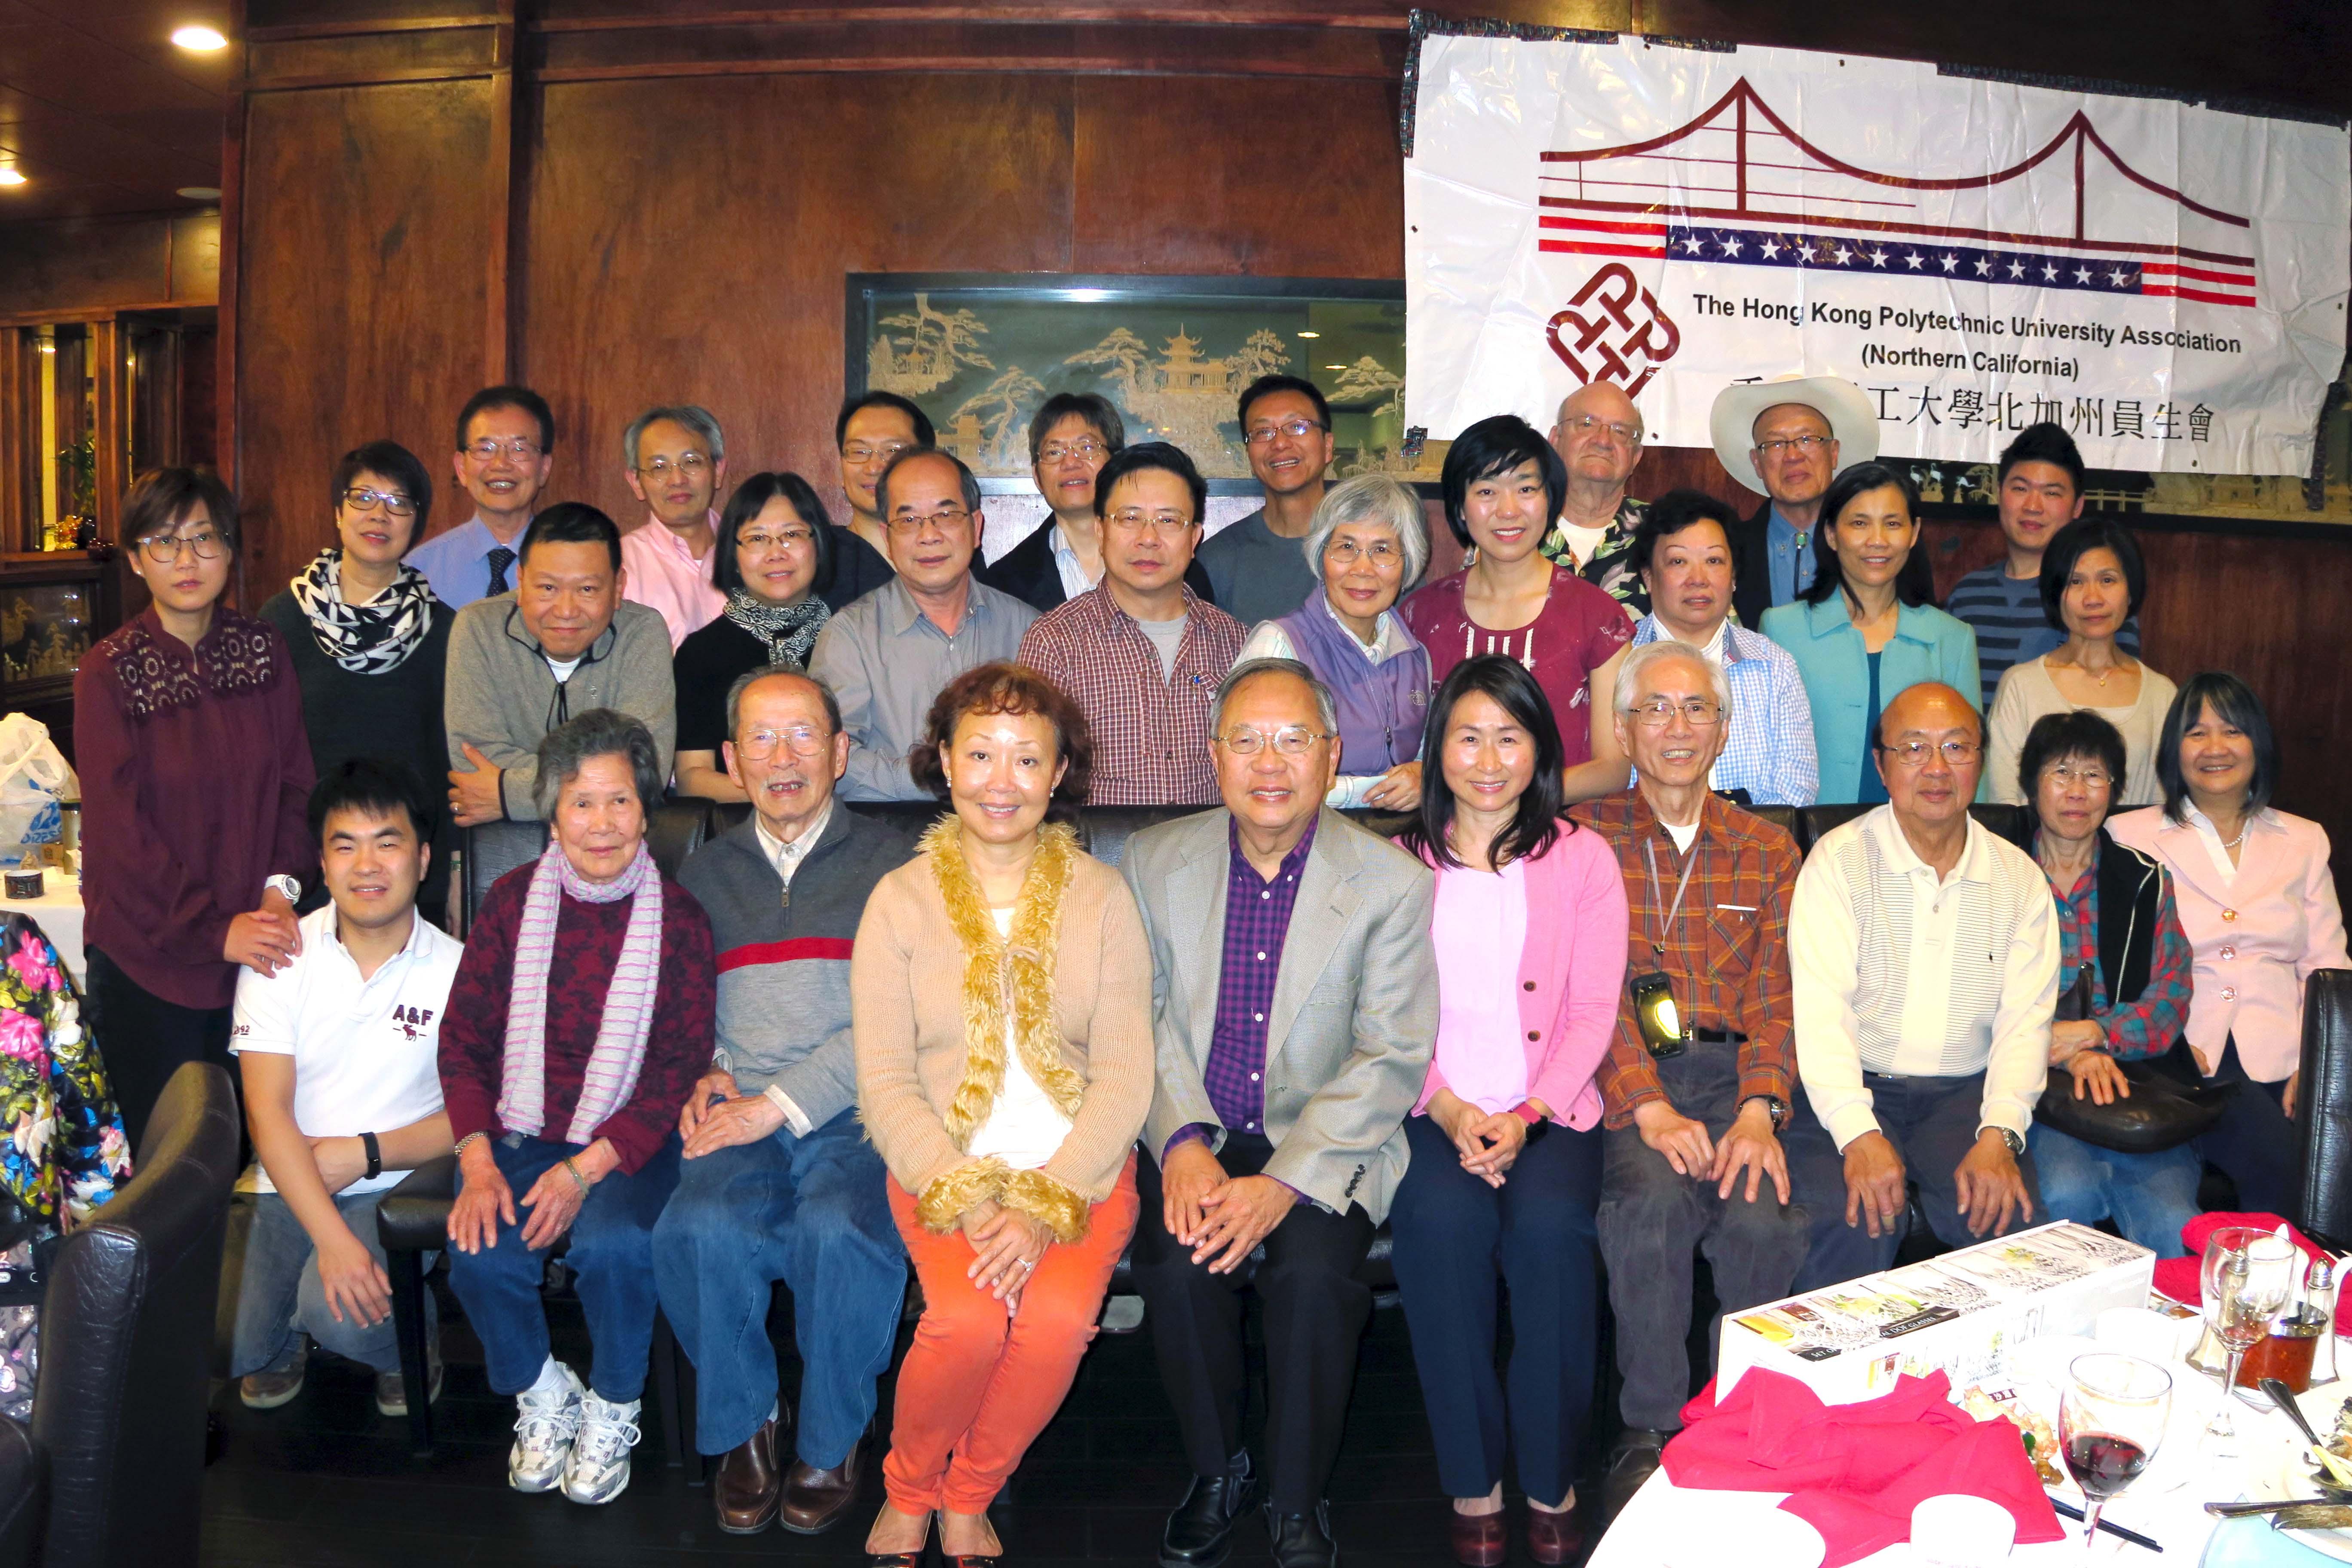 Guests at Polytech U banquet 2016